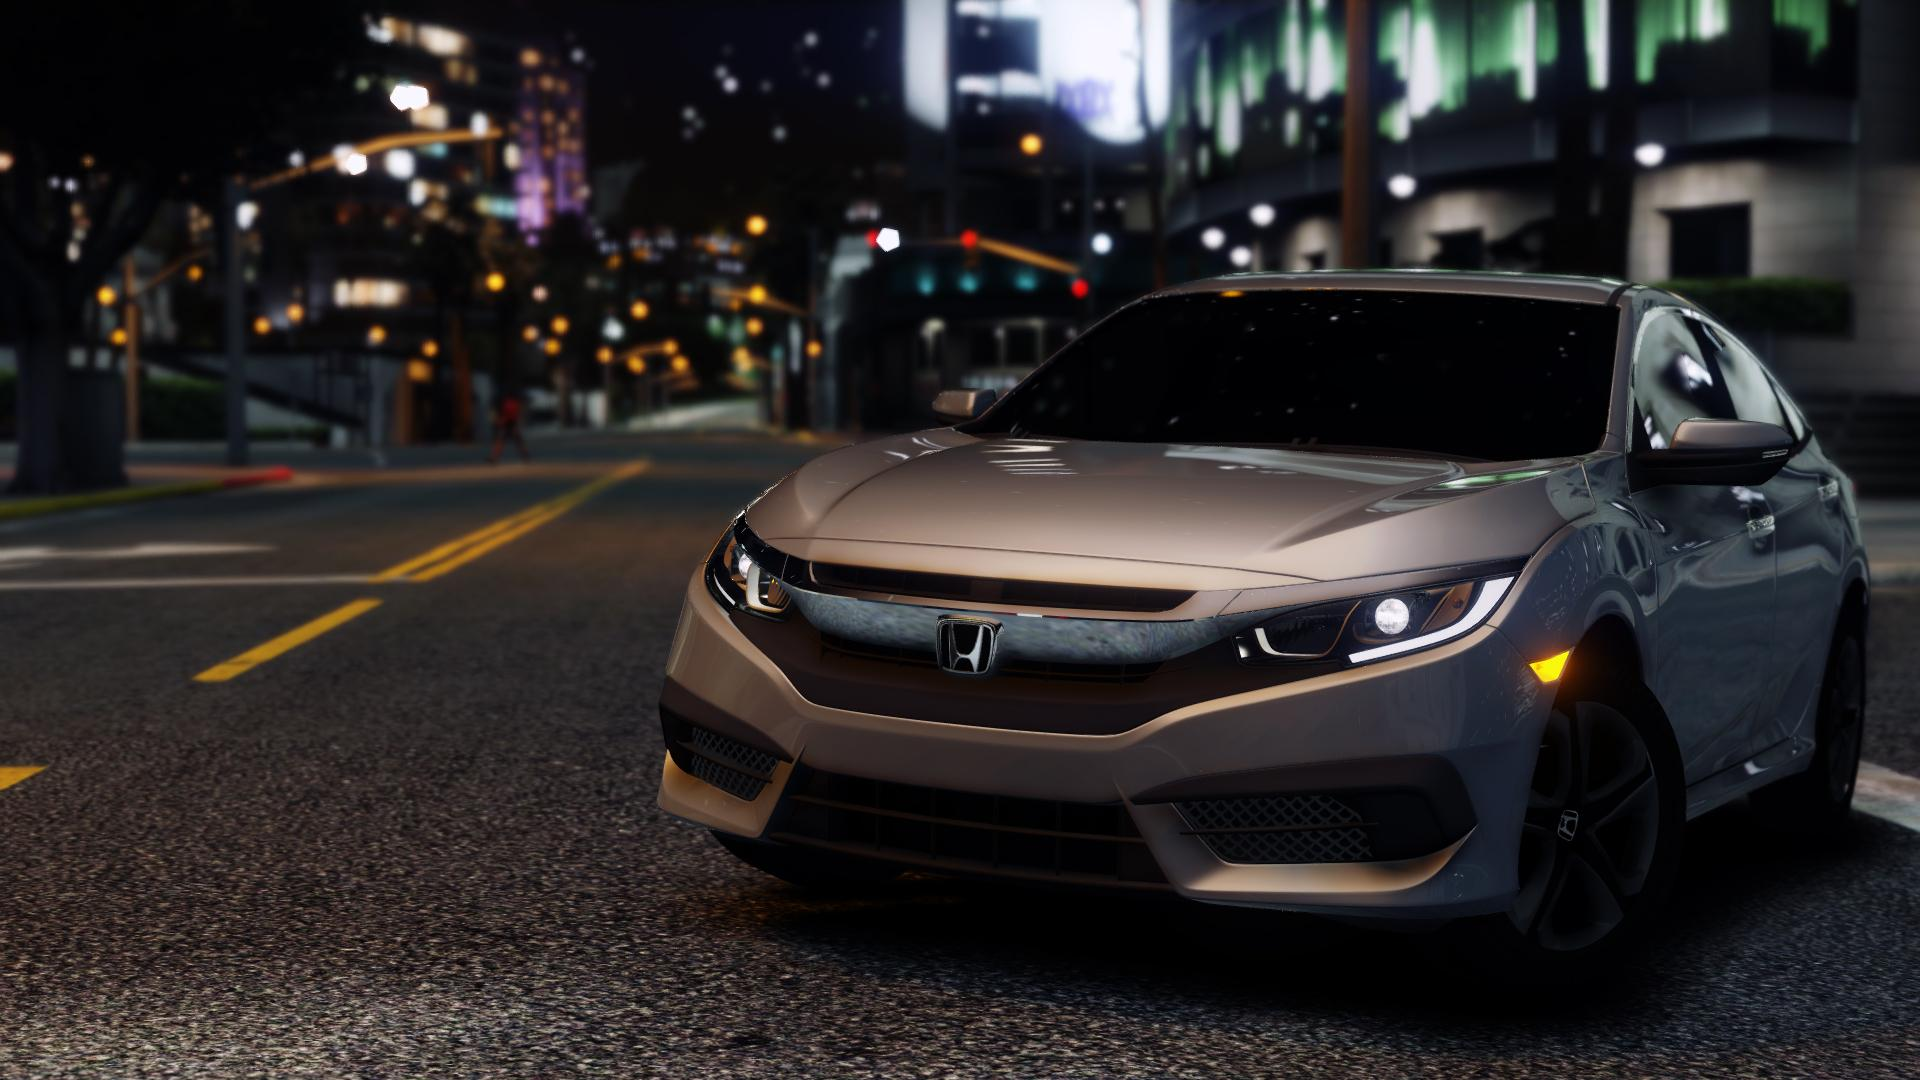 2017 Honda Civic LX Sedan - GTA5-Mods.com